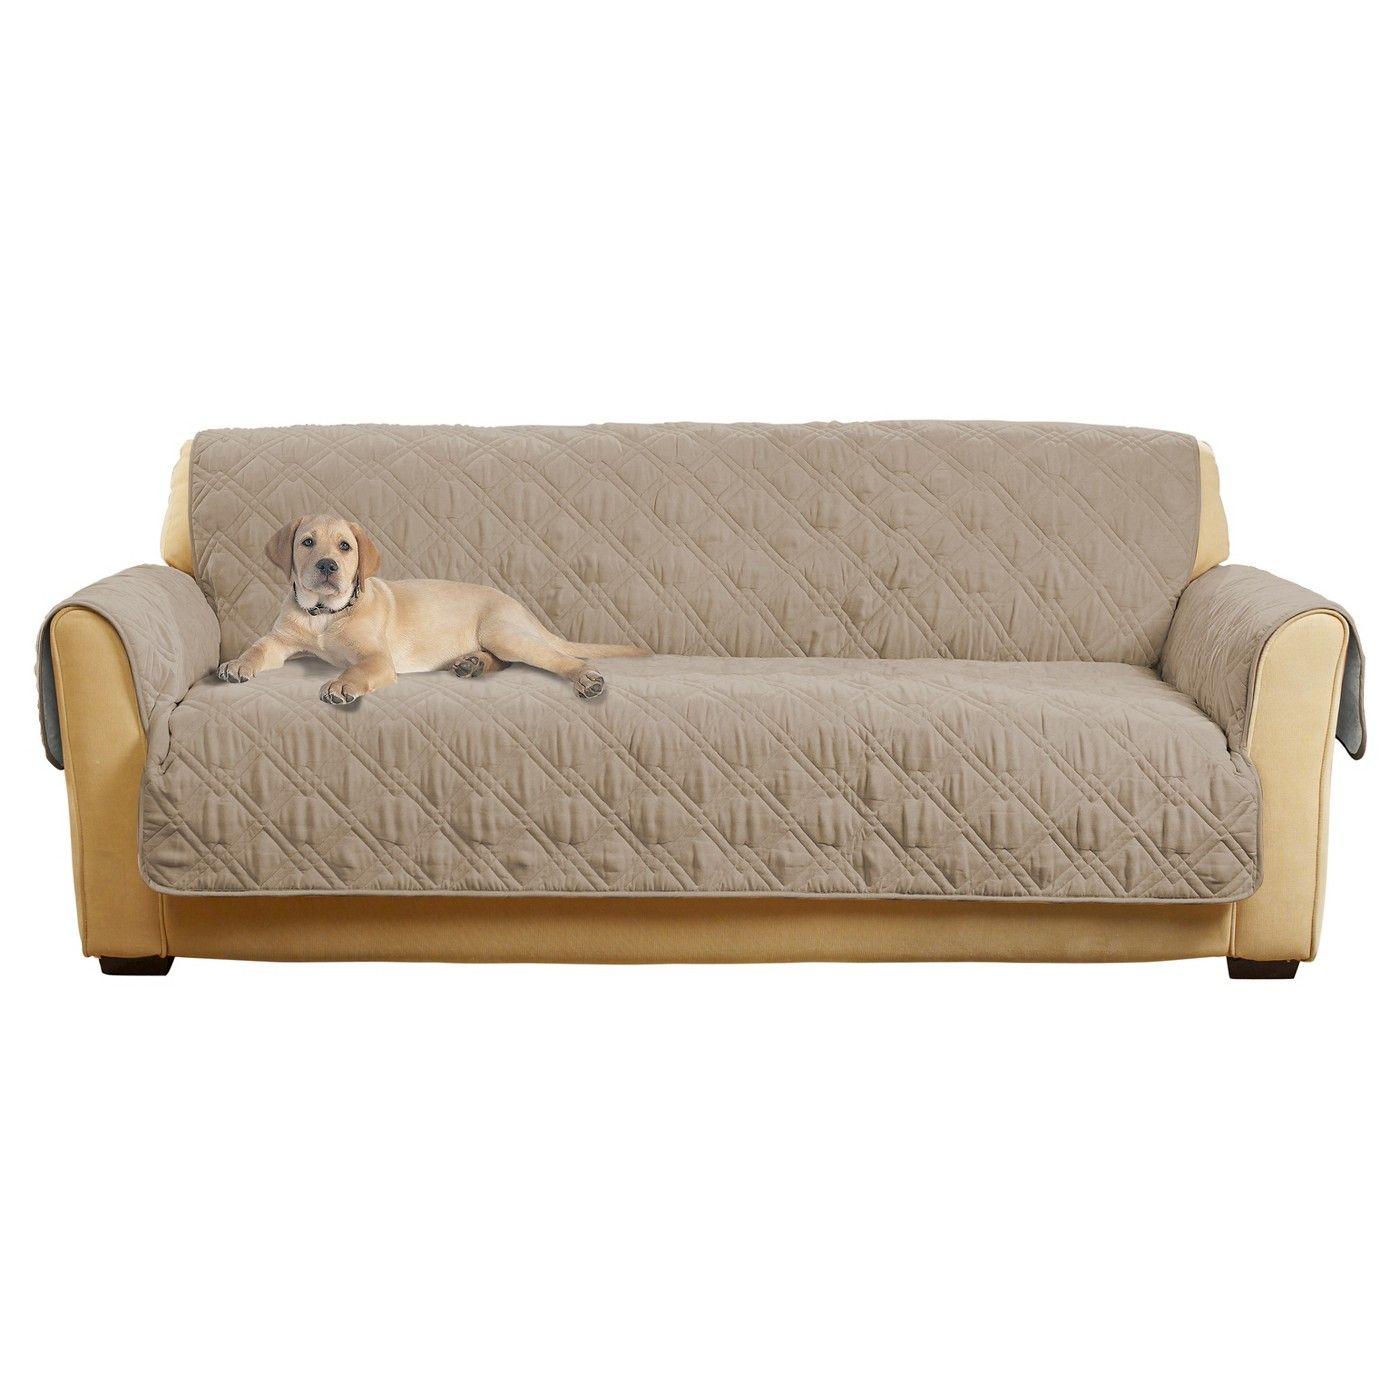 Non Slip Waterproof Sofa Furniture Cover Sure Fit Image 1 Of 3